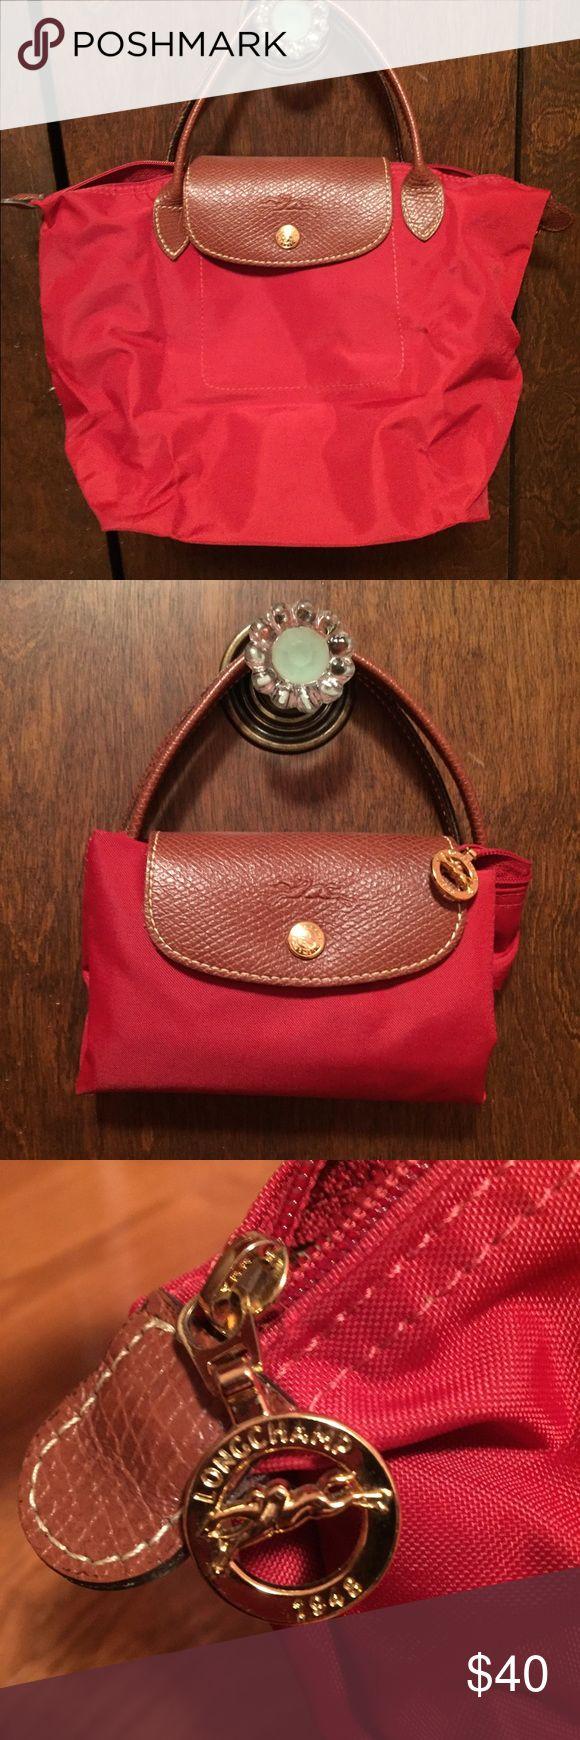 Limited Portable Longchamp Le Pliage Messenger Bags Chocolate